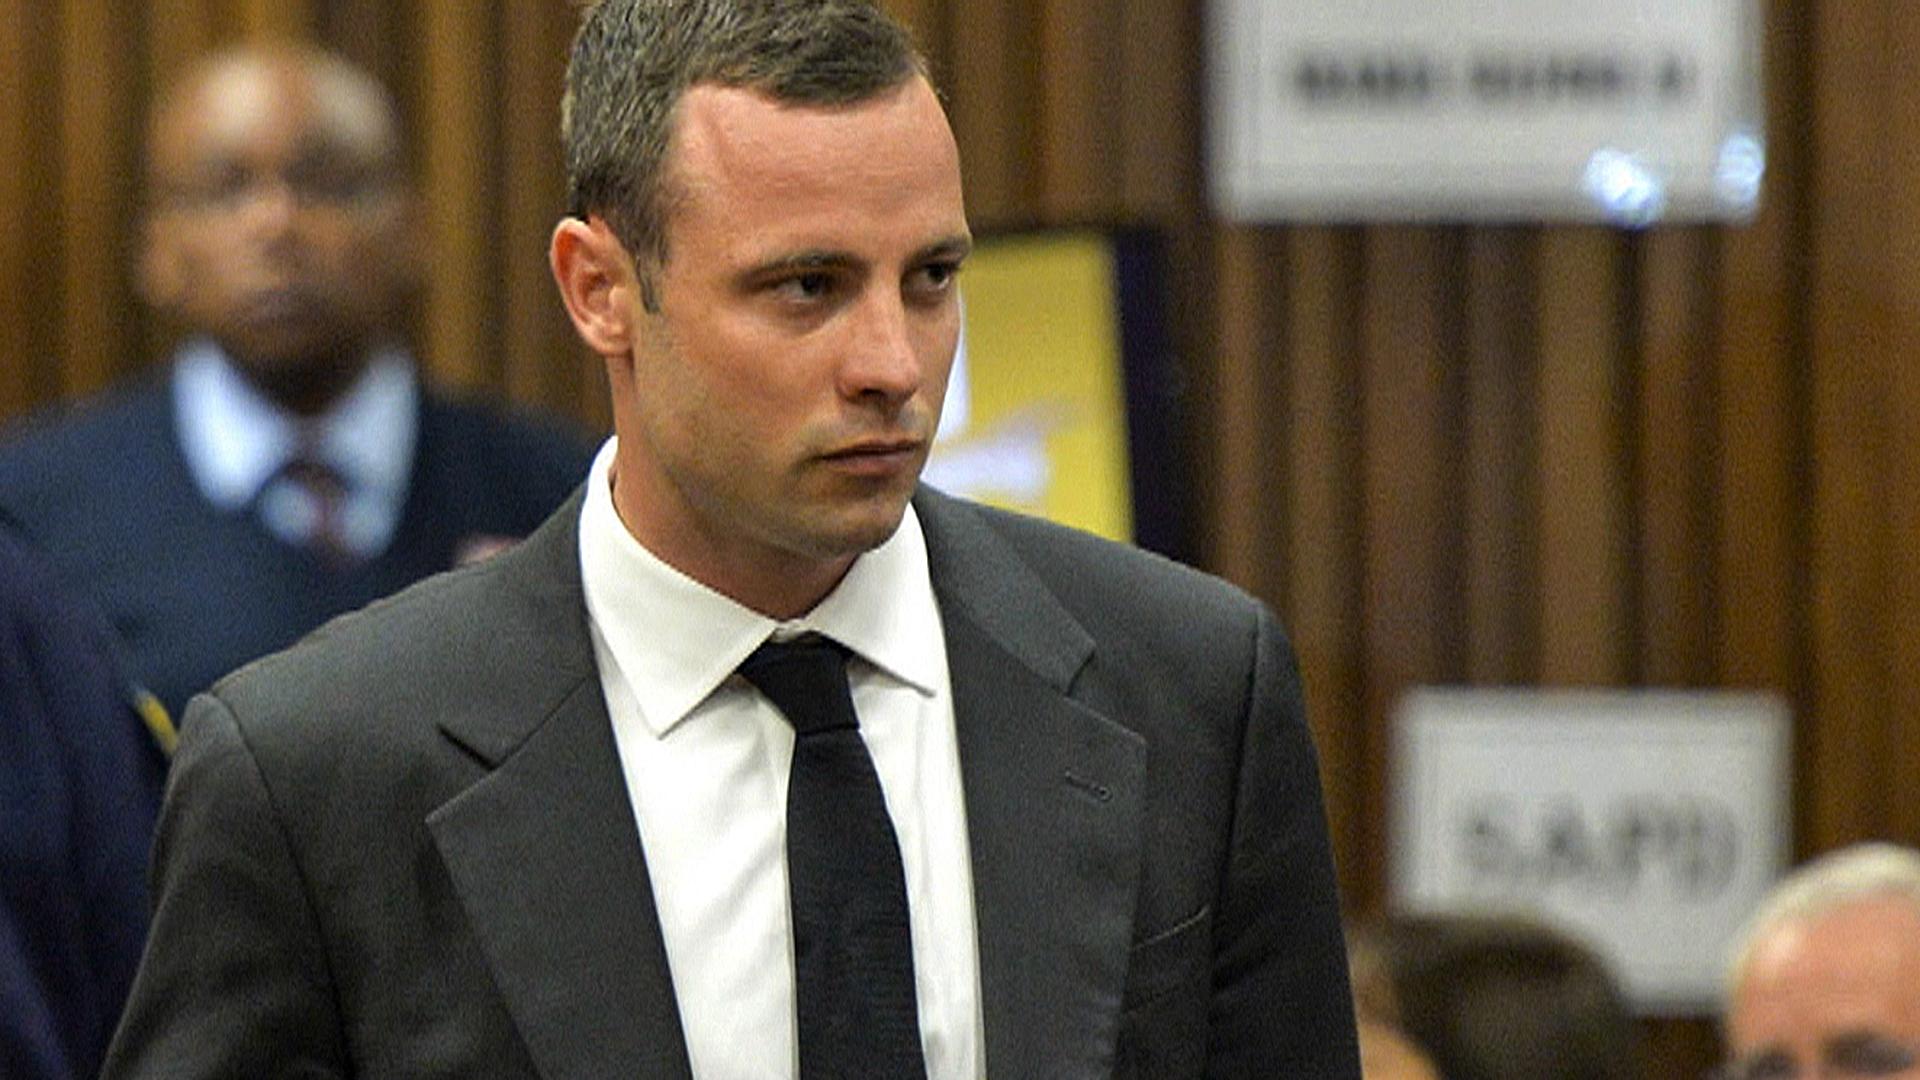 Pistorius Trial Witness Breaks Down During Cross-Examination